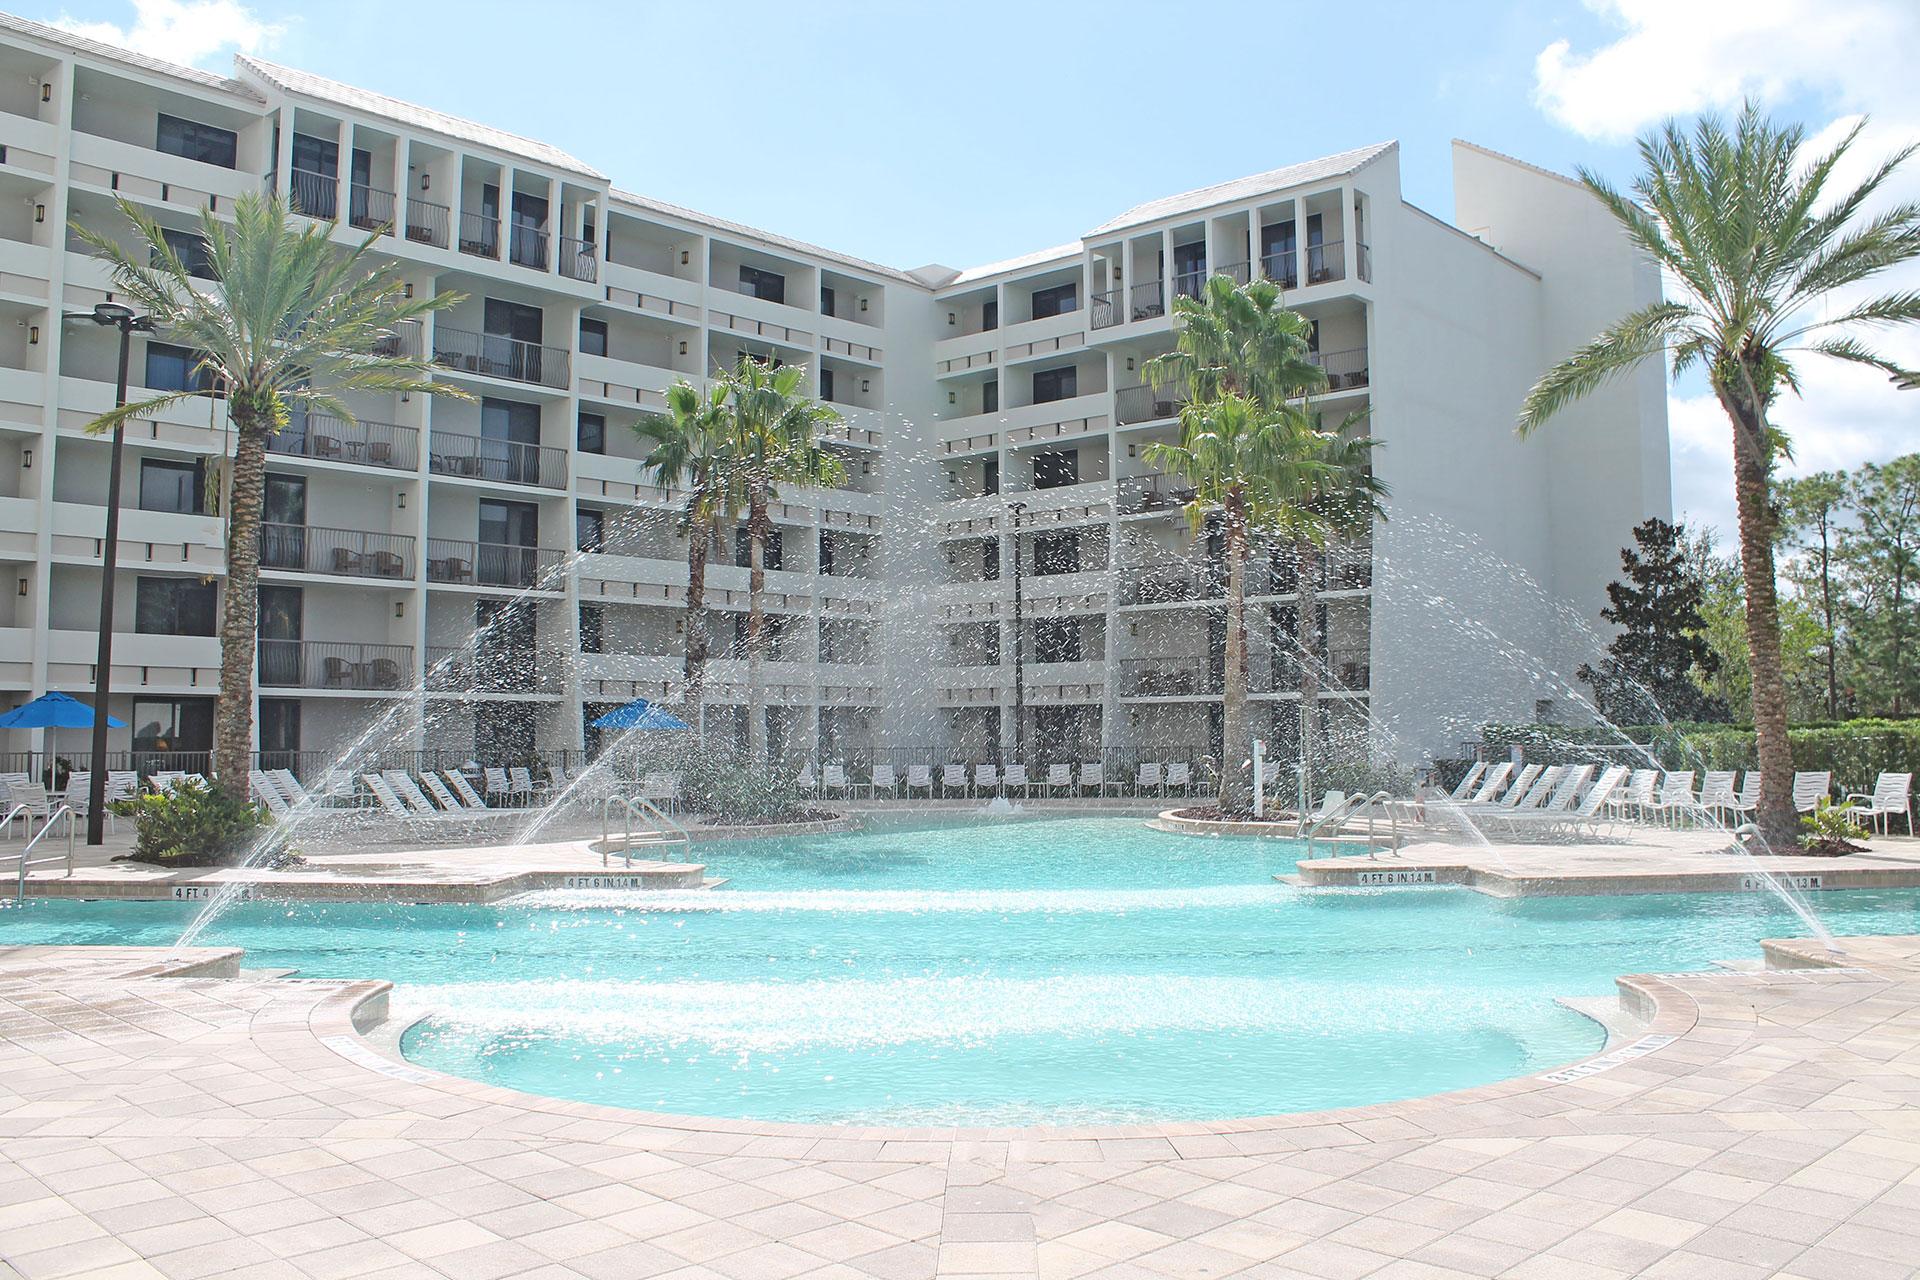 Pool at Holiday Inn Orlando Disney Springs; Courtesy of Holiday Inn Orlando Disney Springs